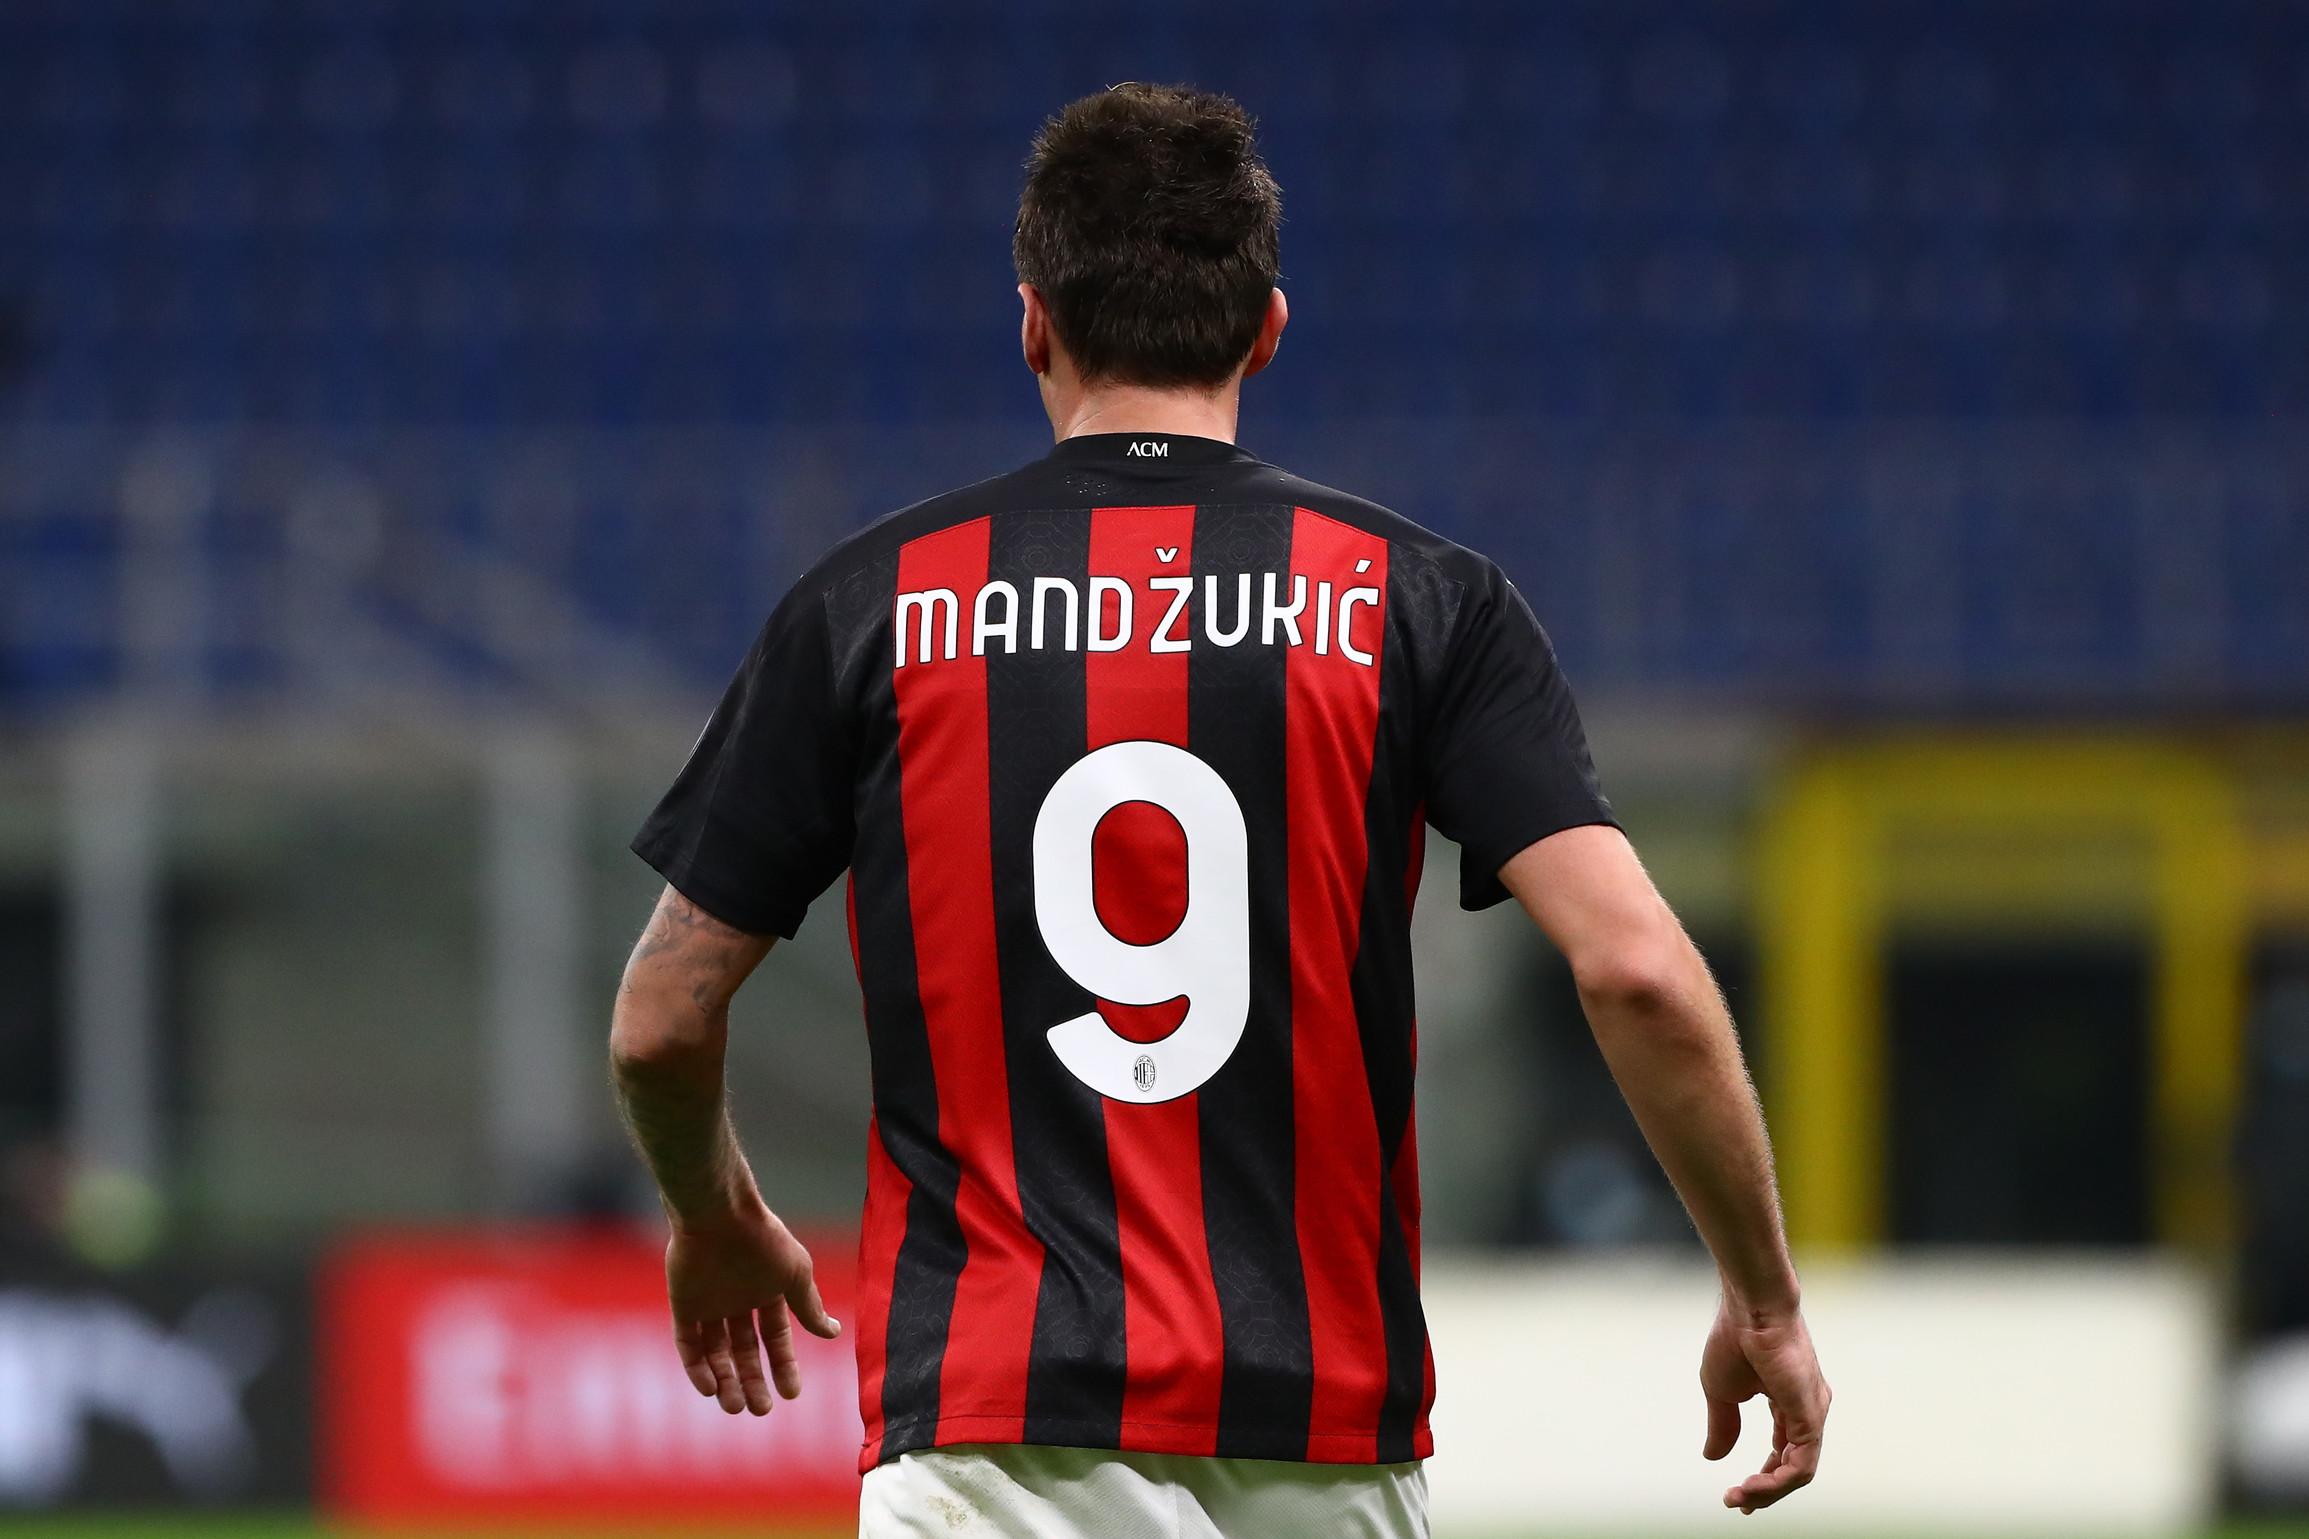 Mandzukic (gennaio-giugno 2021): 11 partite, 0 gol